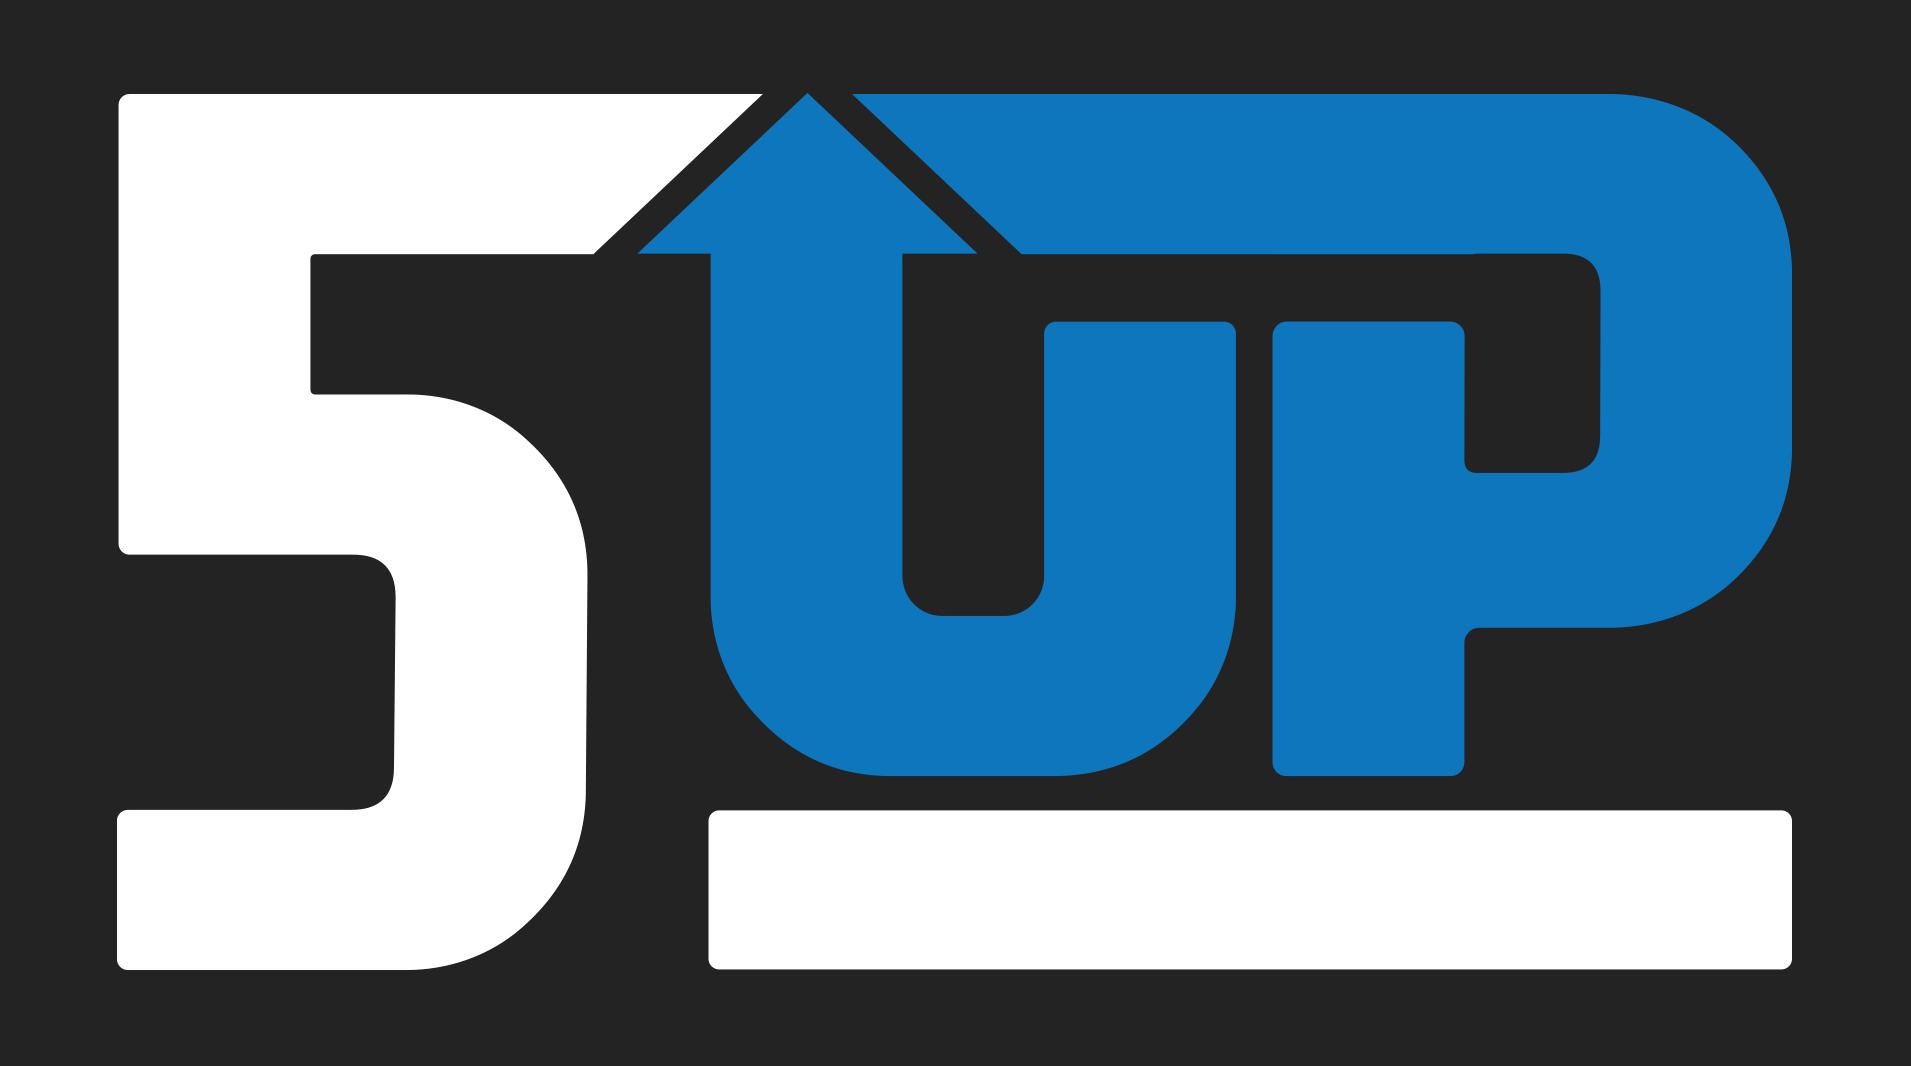 5up - Logo Design